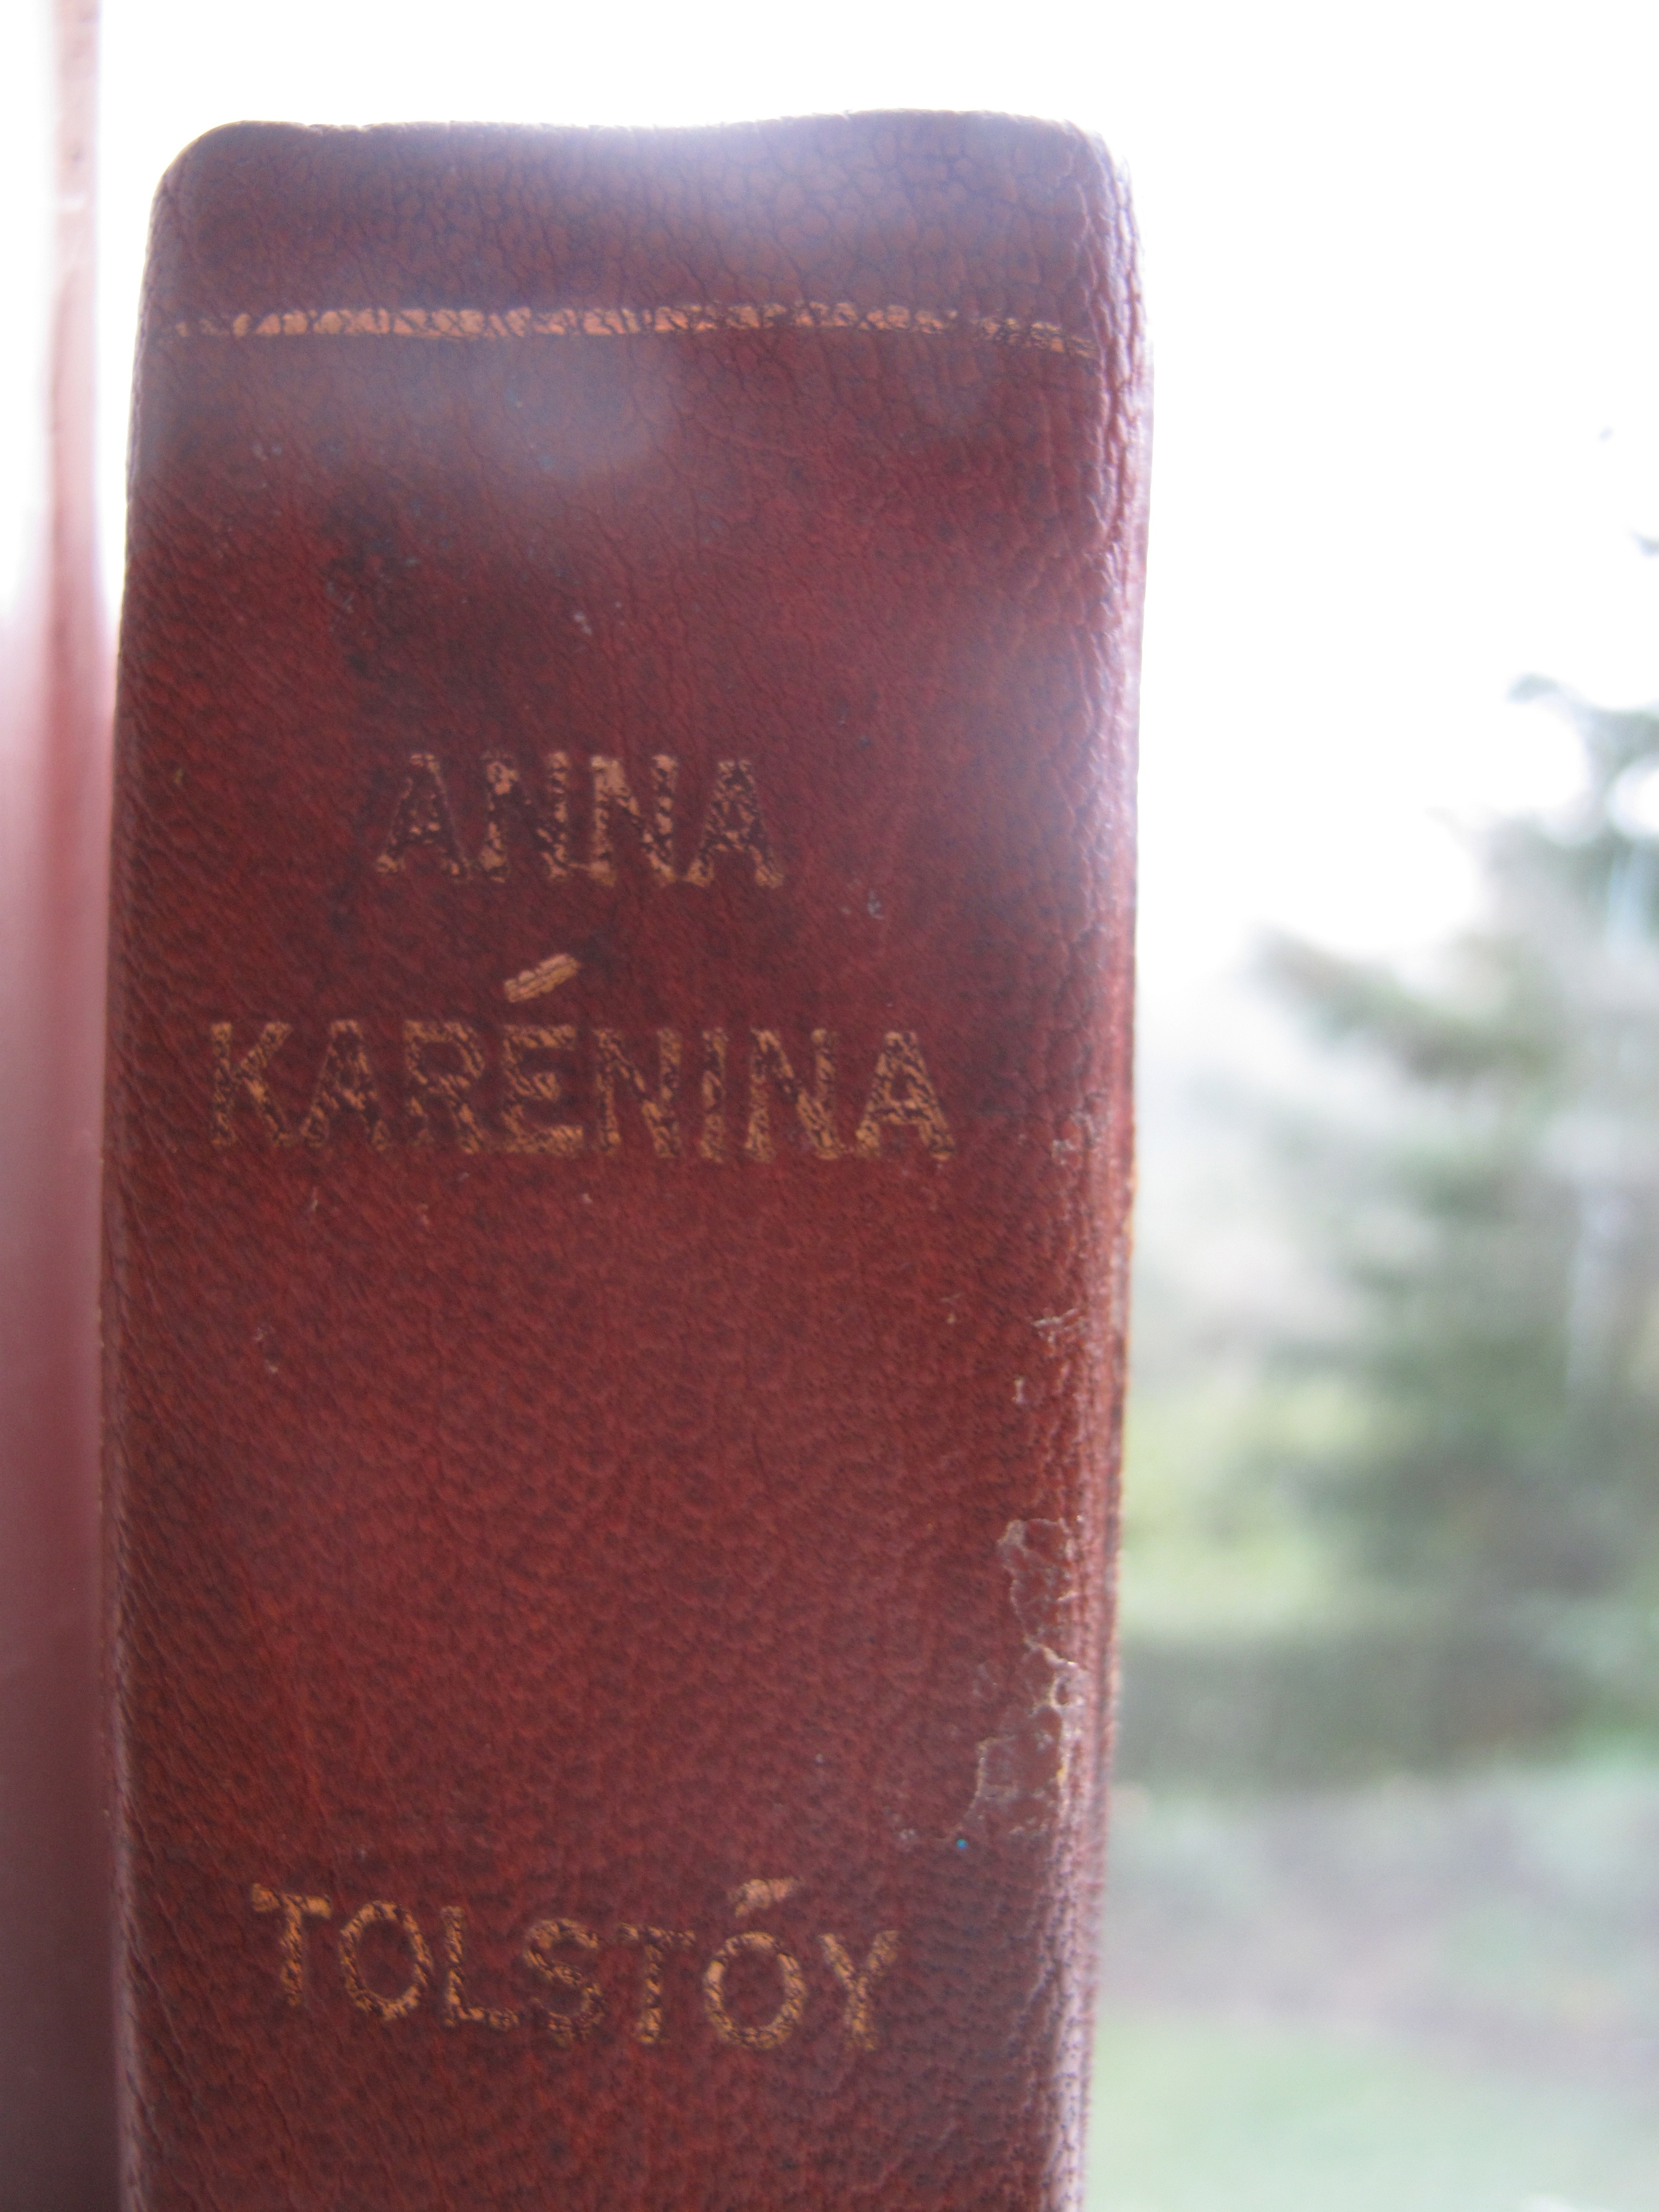 Anna Karenina thoughts on the book